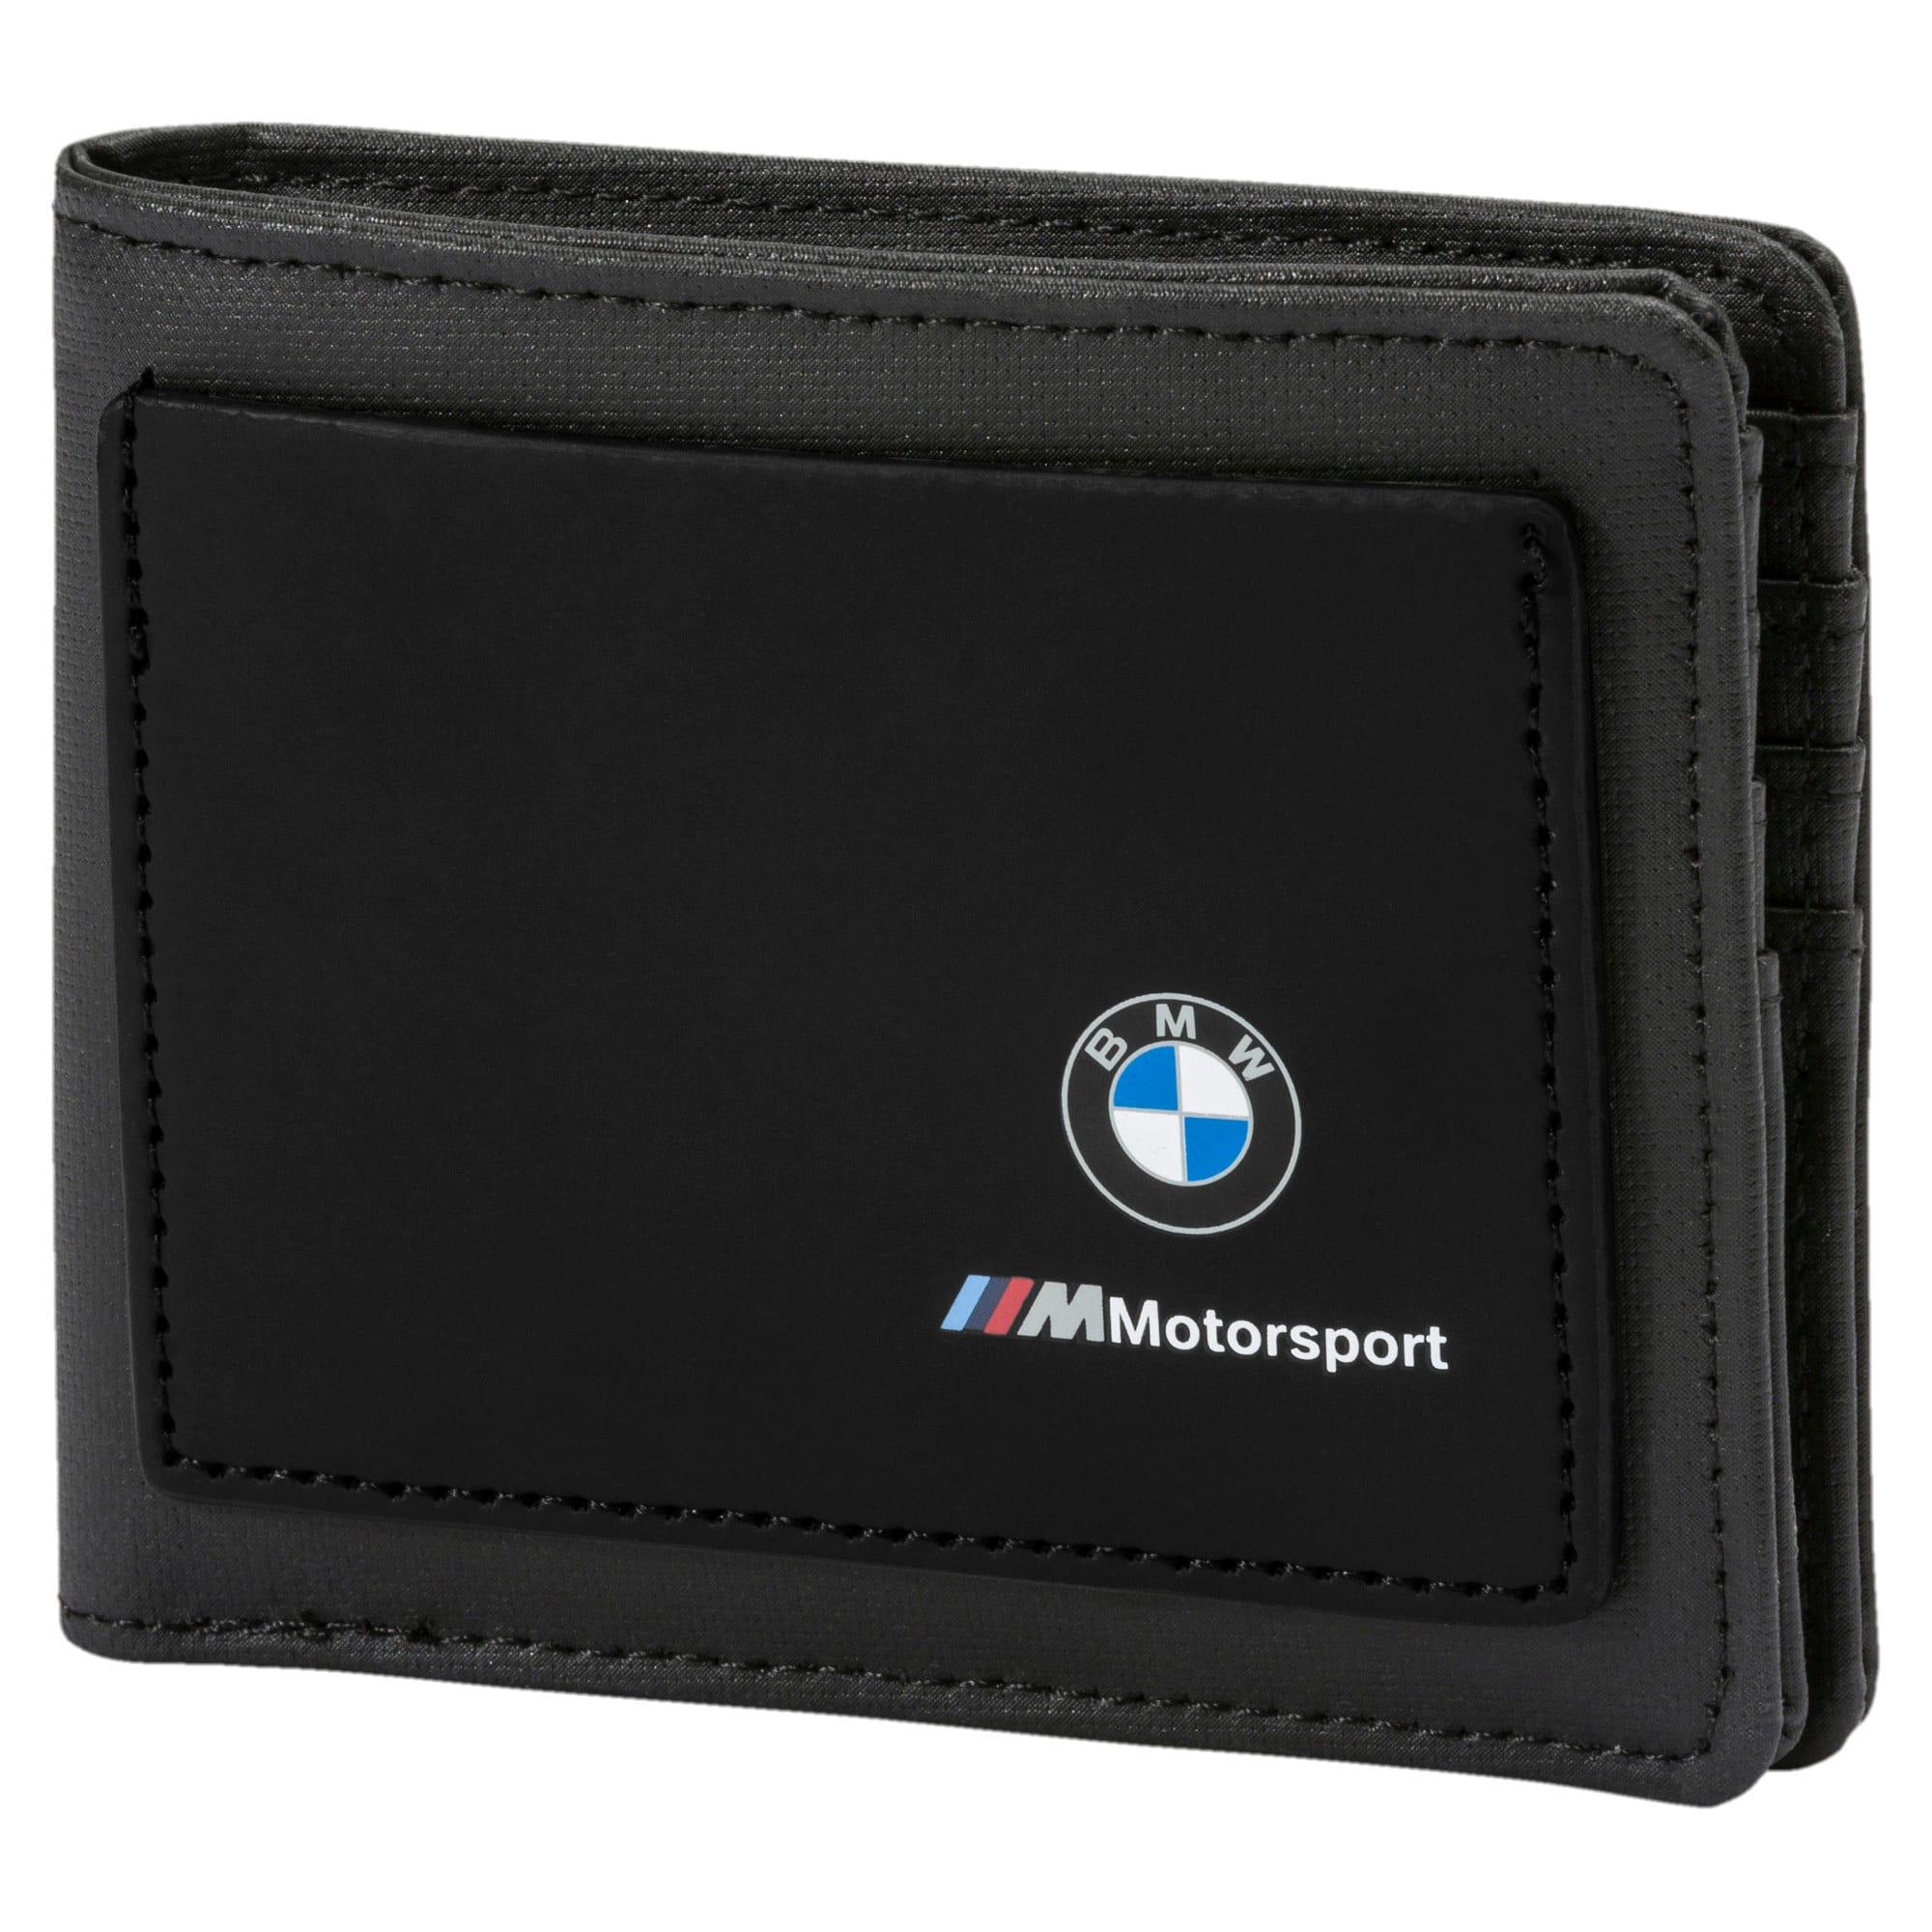 Thumbnail 1 of BMW Motorsport Wallet, Puma Black, medium-IND